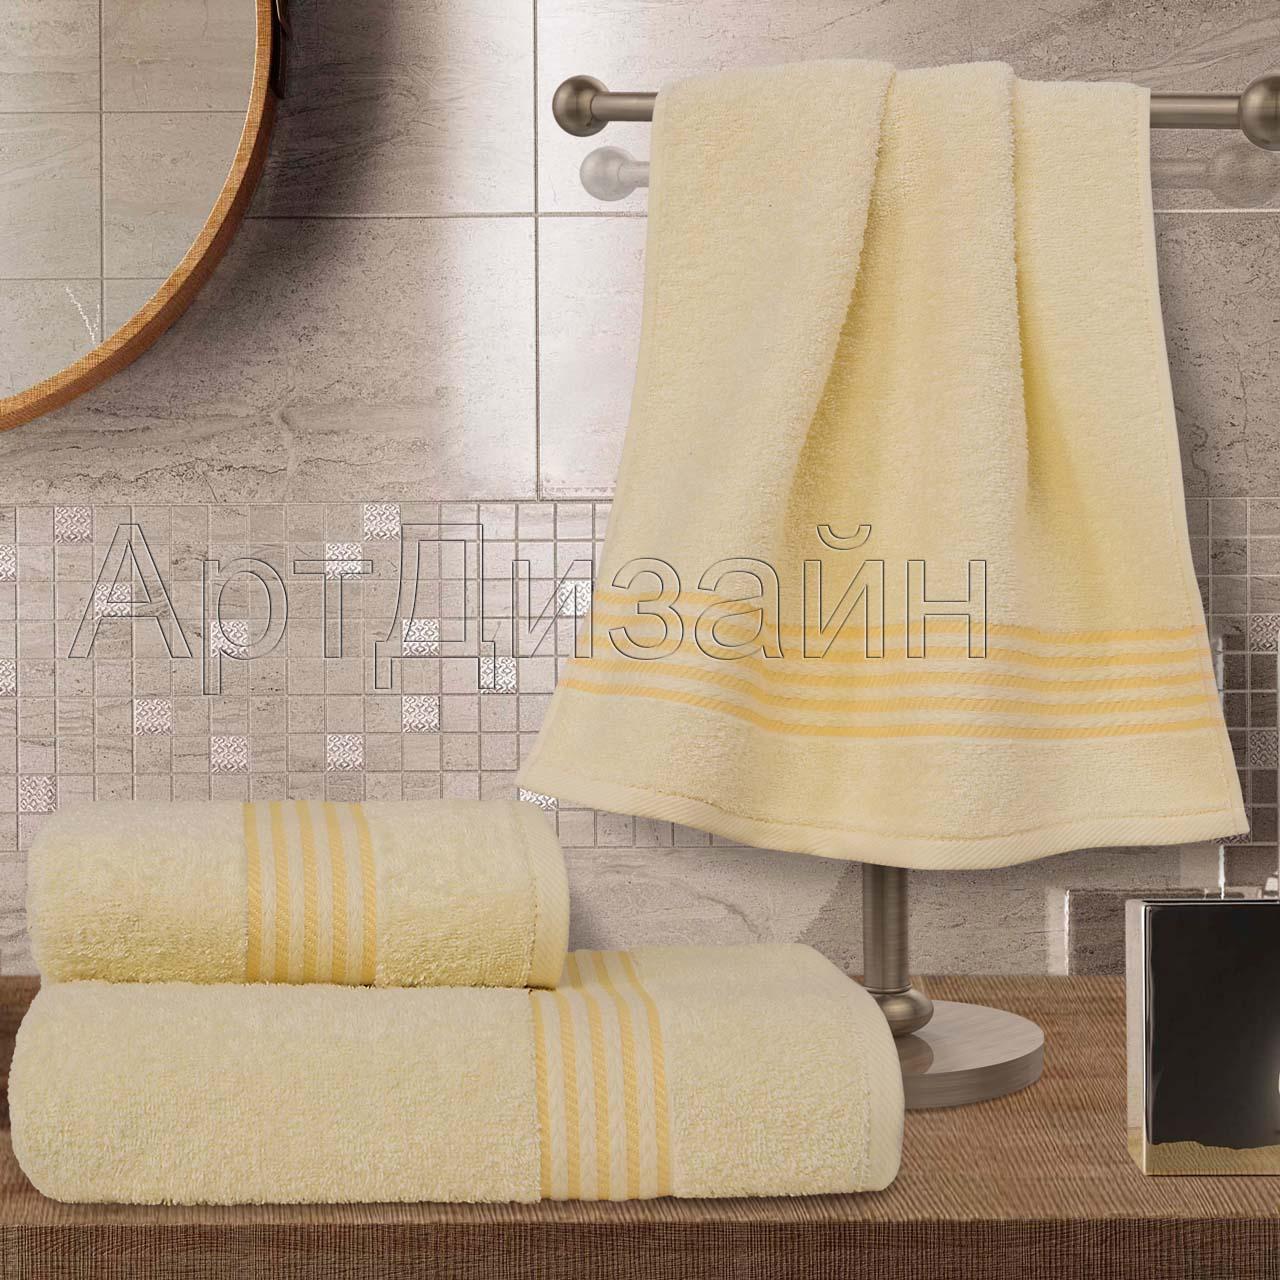 Полотенце Классик Ваниль р. 50х90Махровые полотенца<br>Плотность: 400 г/кв. м<br><br>Тип: Полотенце<br>Размер: 50х90<br>Материал: Махра